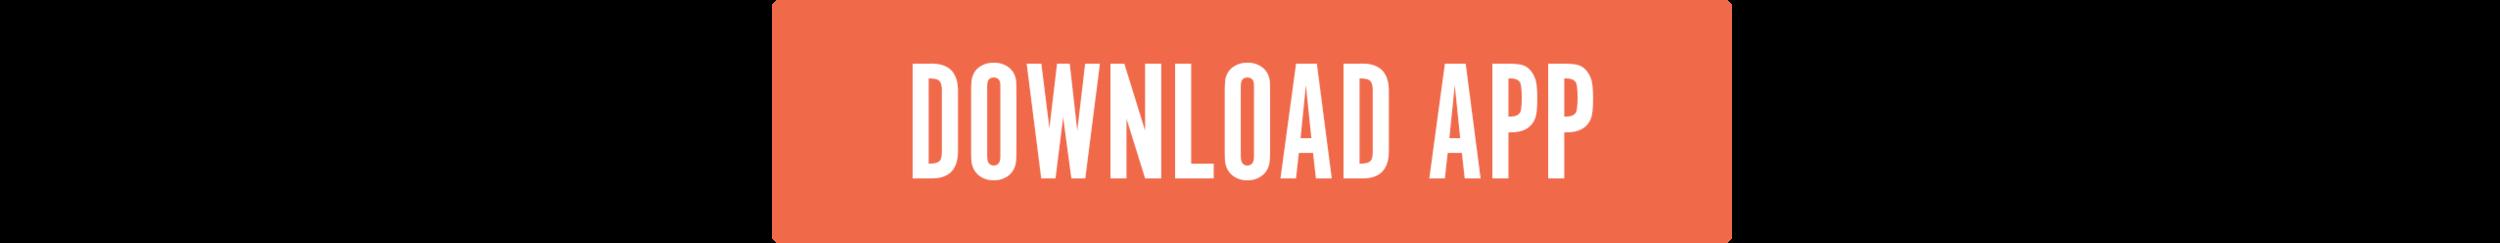 download (2) (1).png